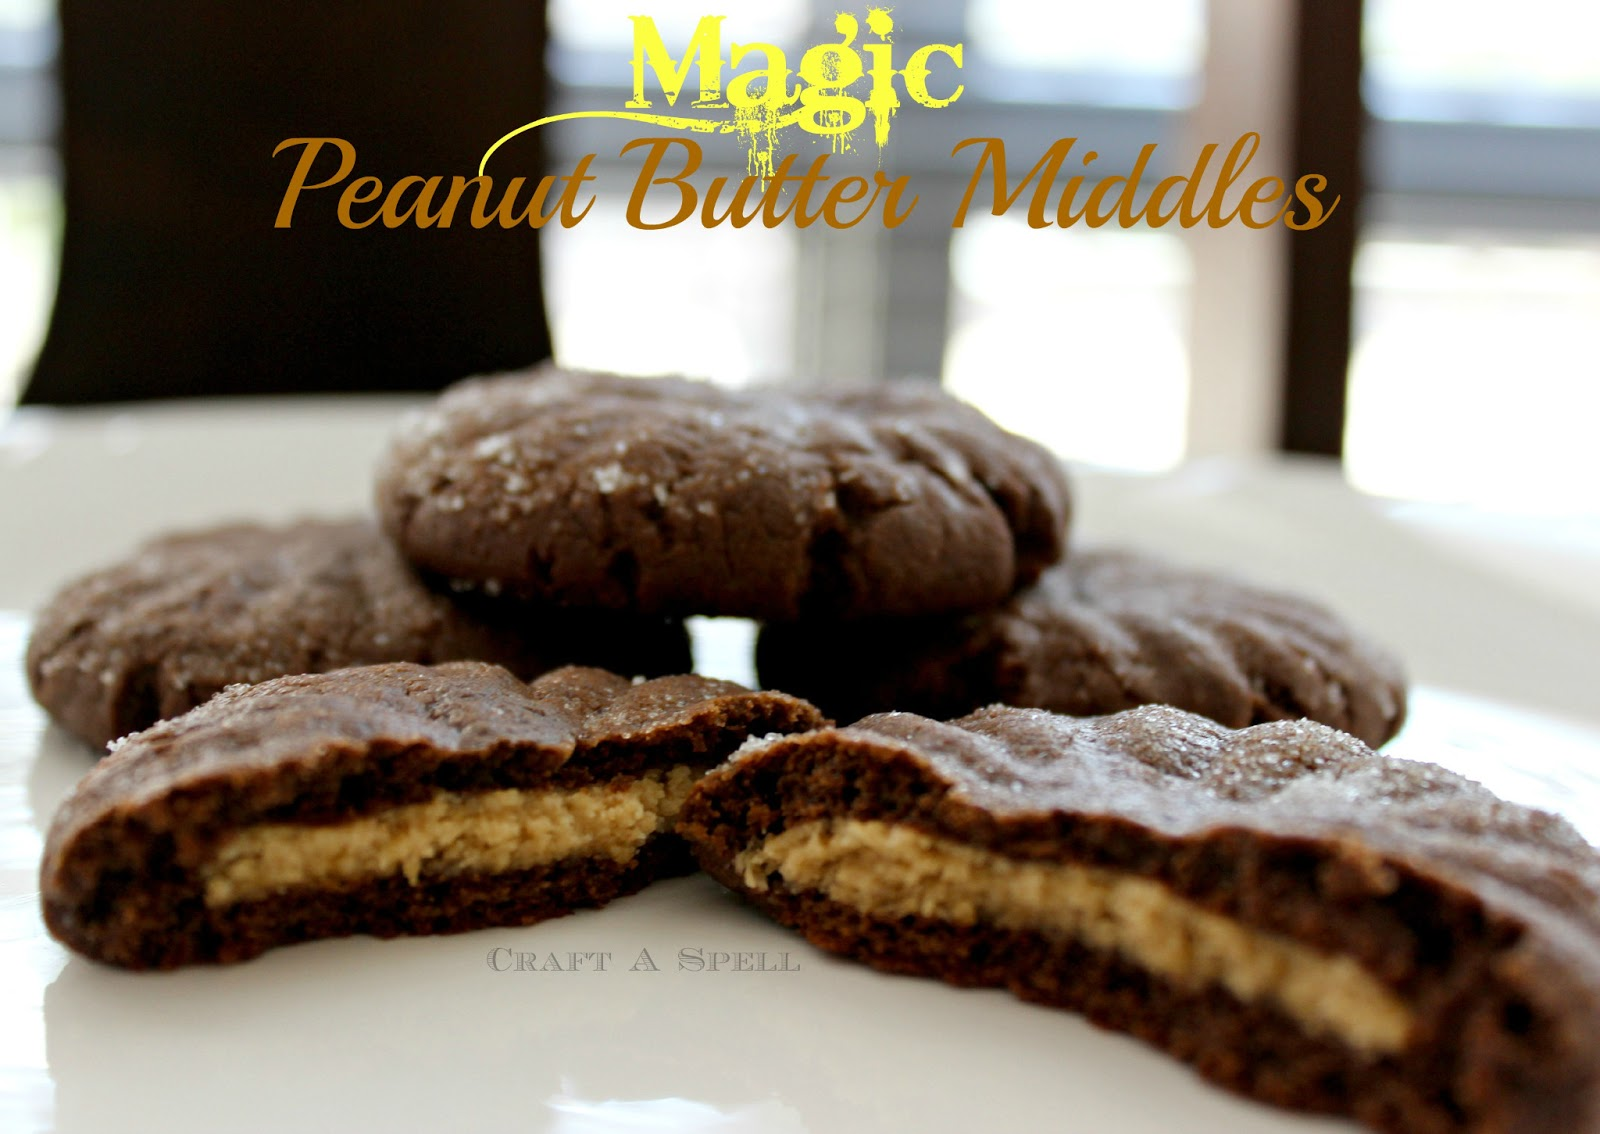 Craft A Spell: Magic Peanut Butter Middles